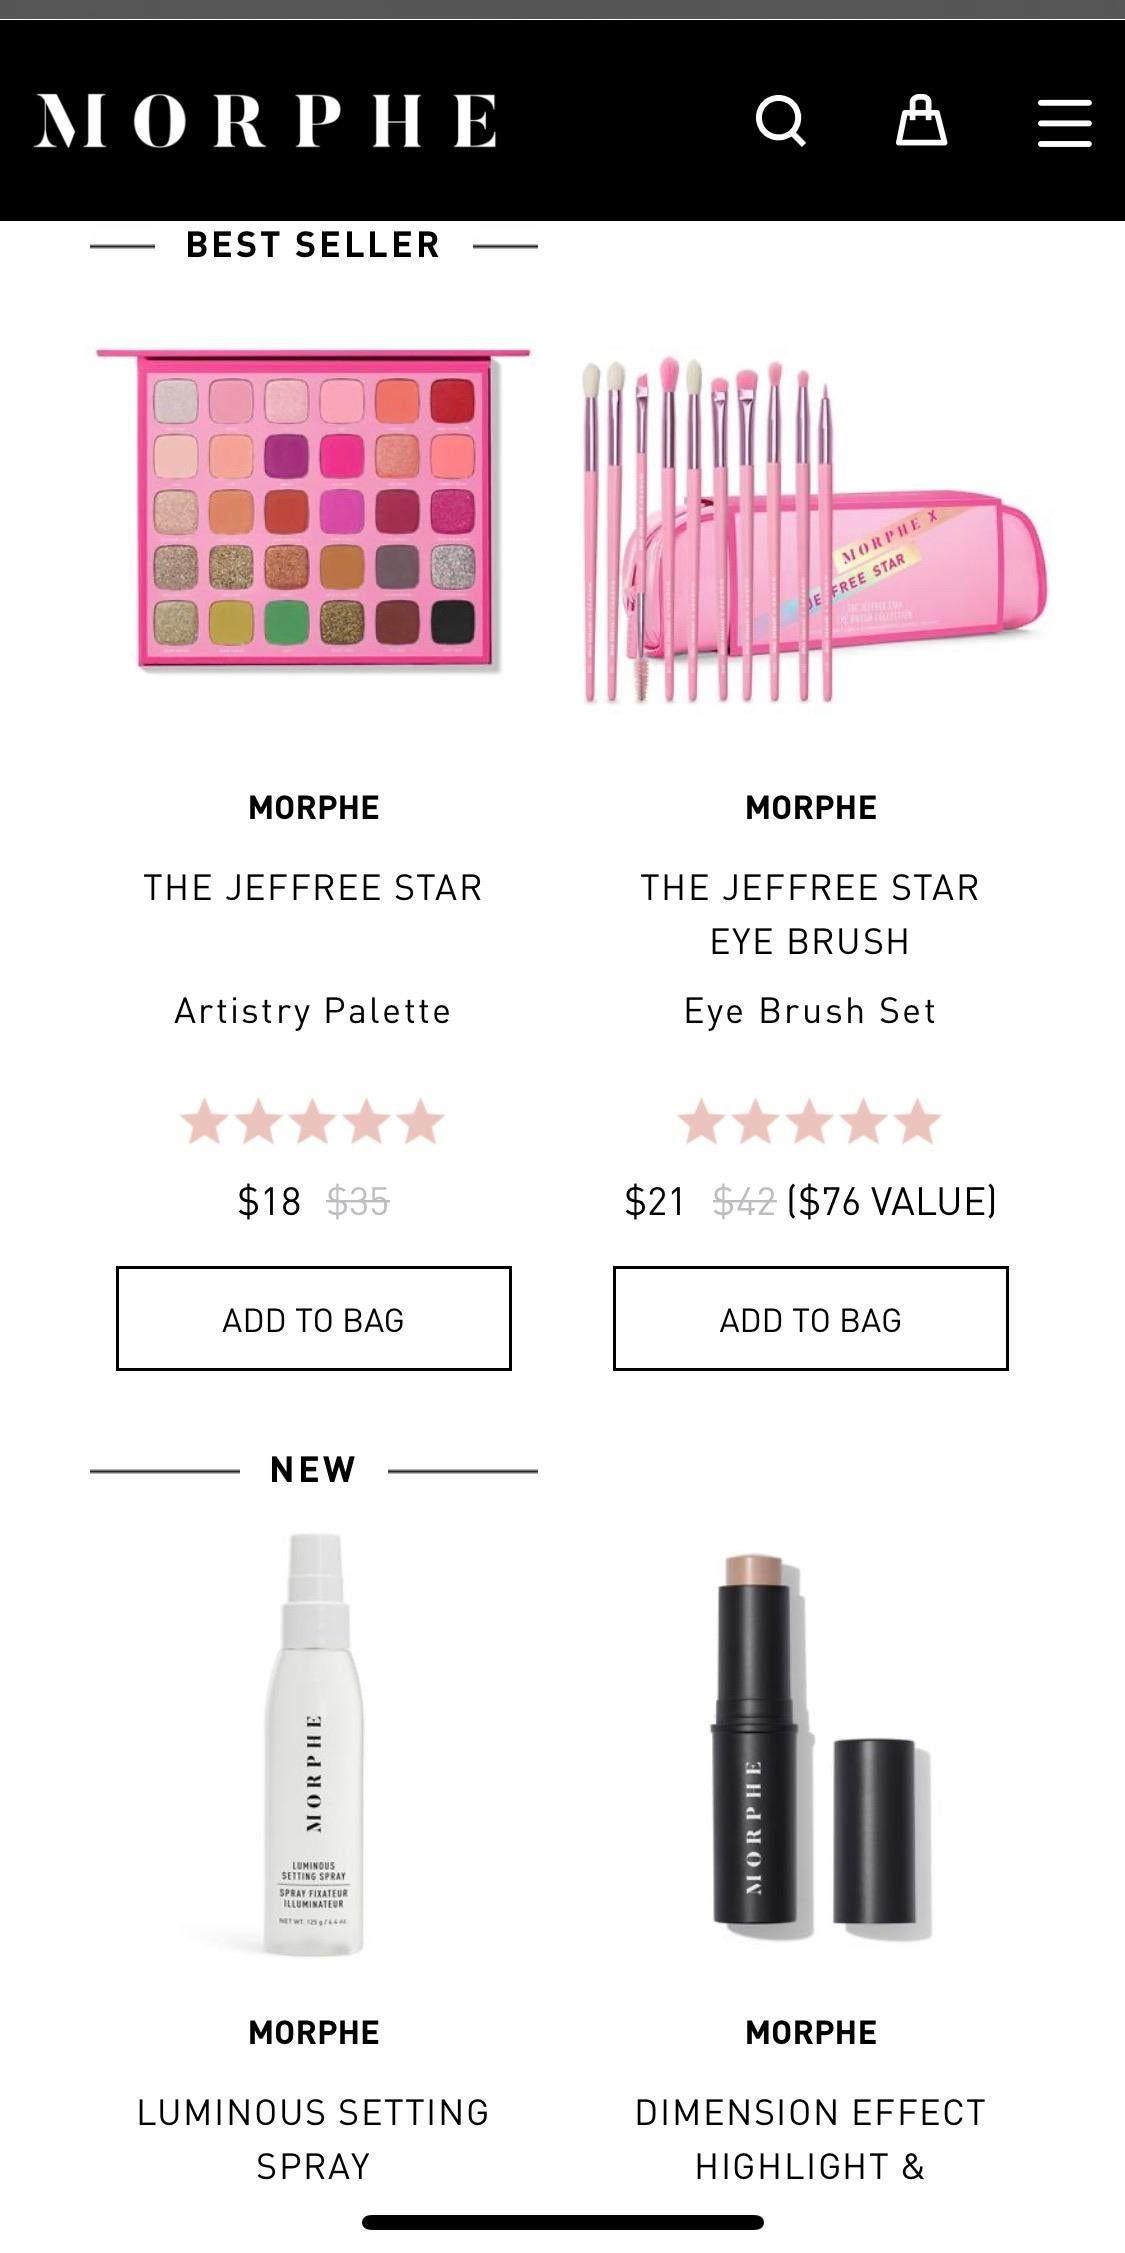 Jeffree Star x Morphe Artistry Palette and Eye brush set